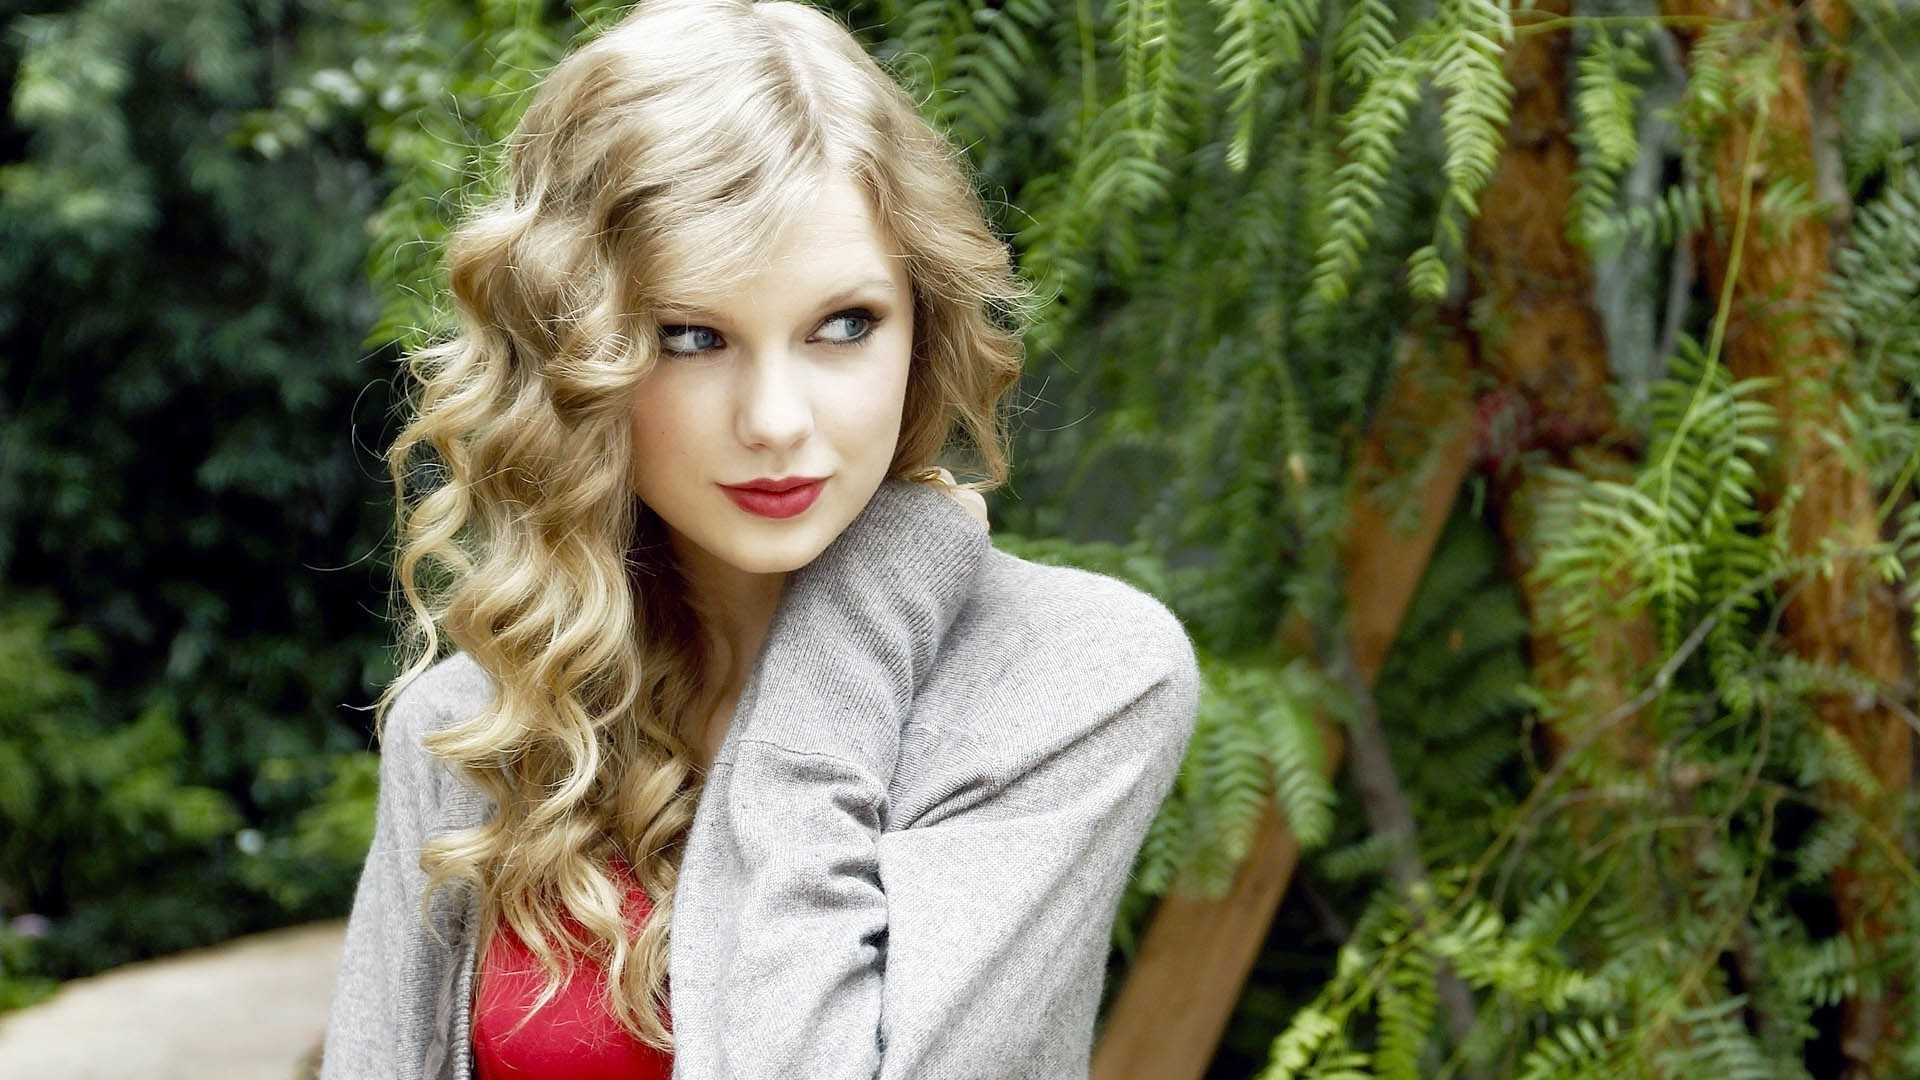 Taylor Swift Background Wallpaper